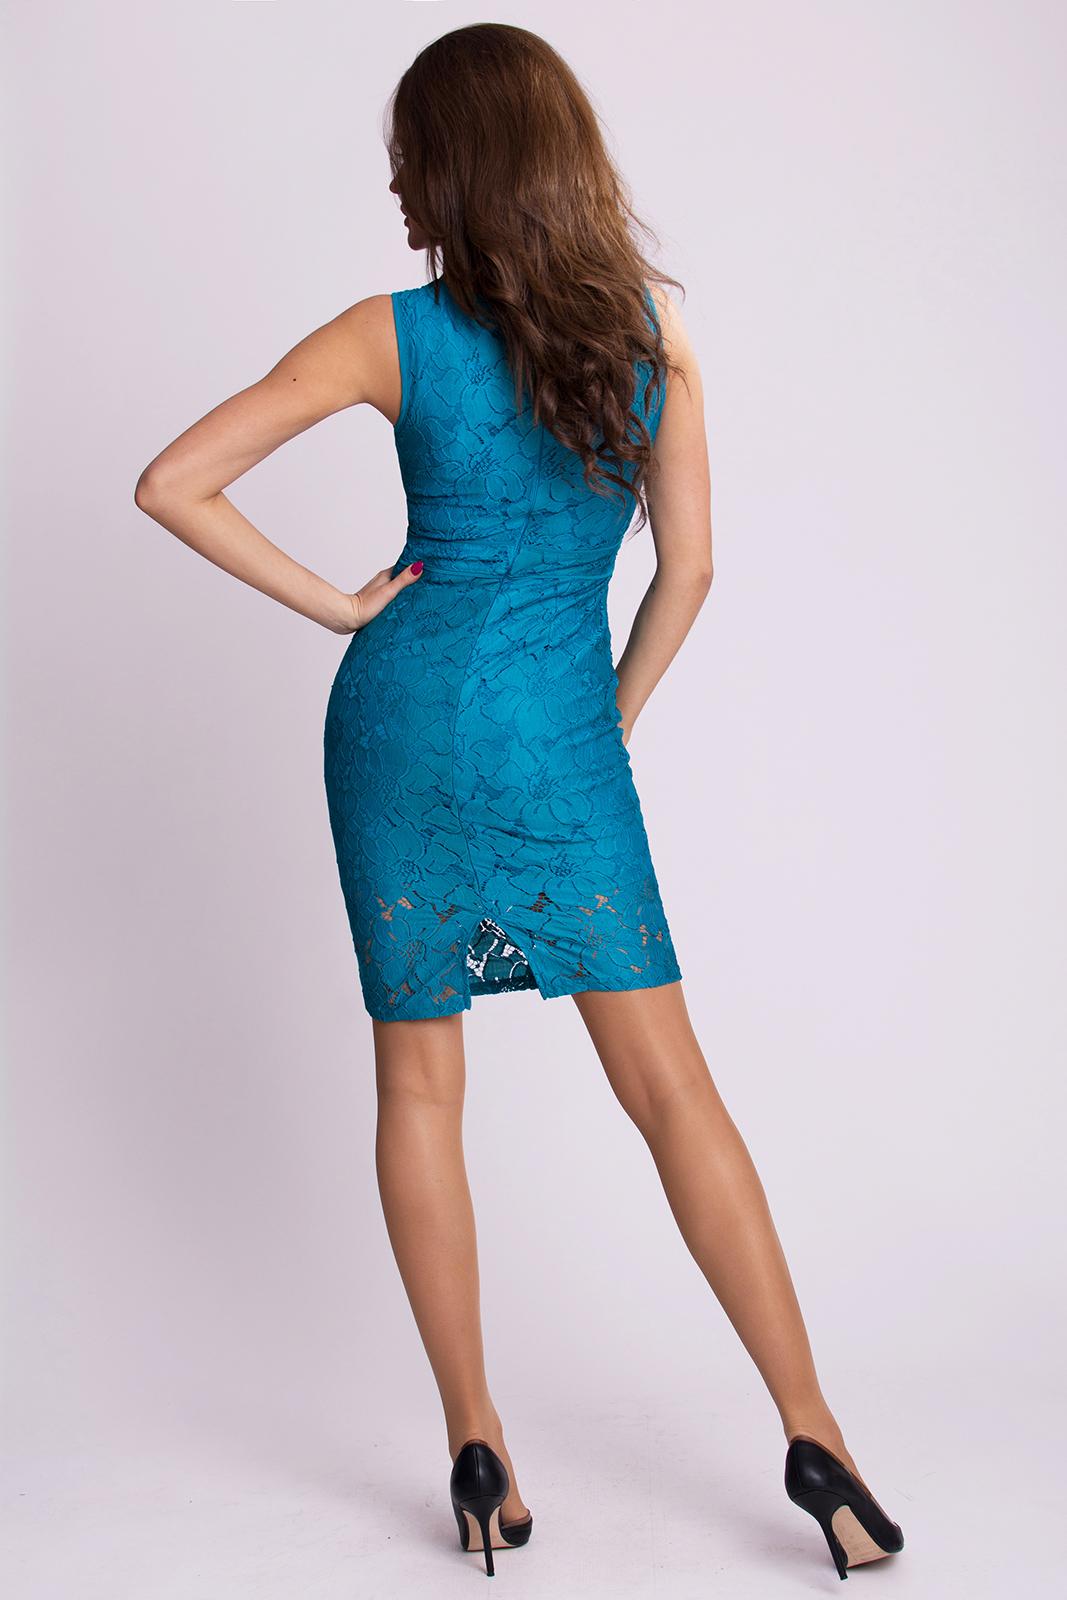 EMAMODA DRESS - dark blue 9704-4